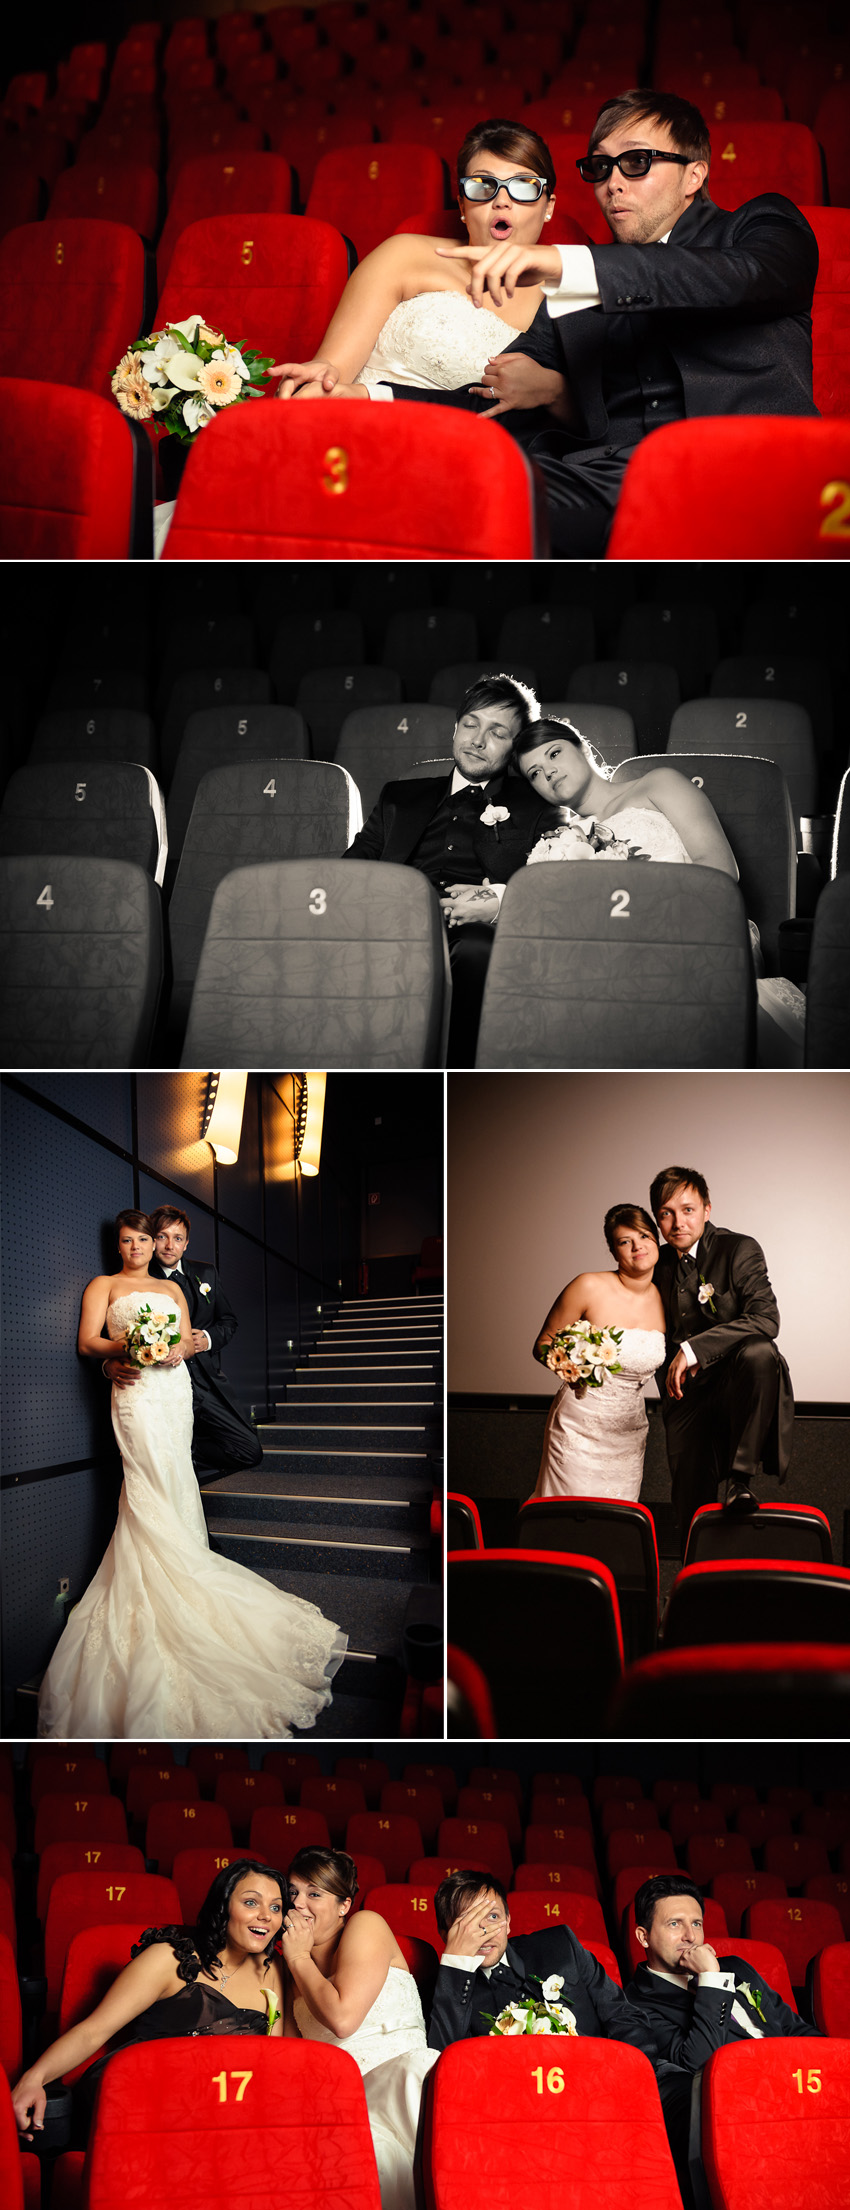 Hochzeitsfoto im Kino Brautpaarshooting